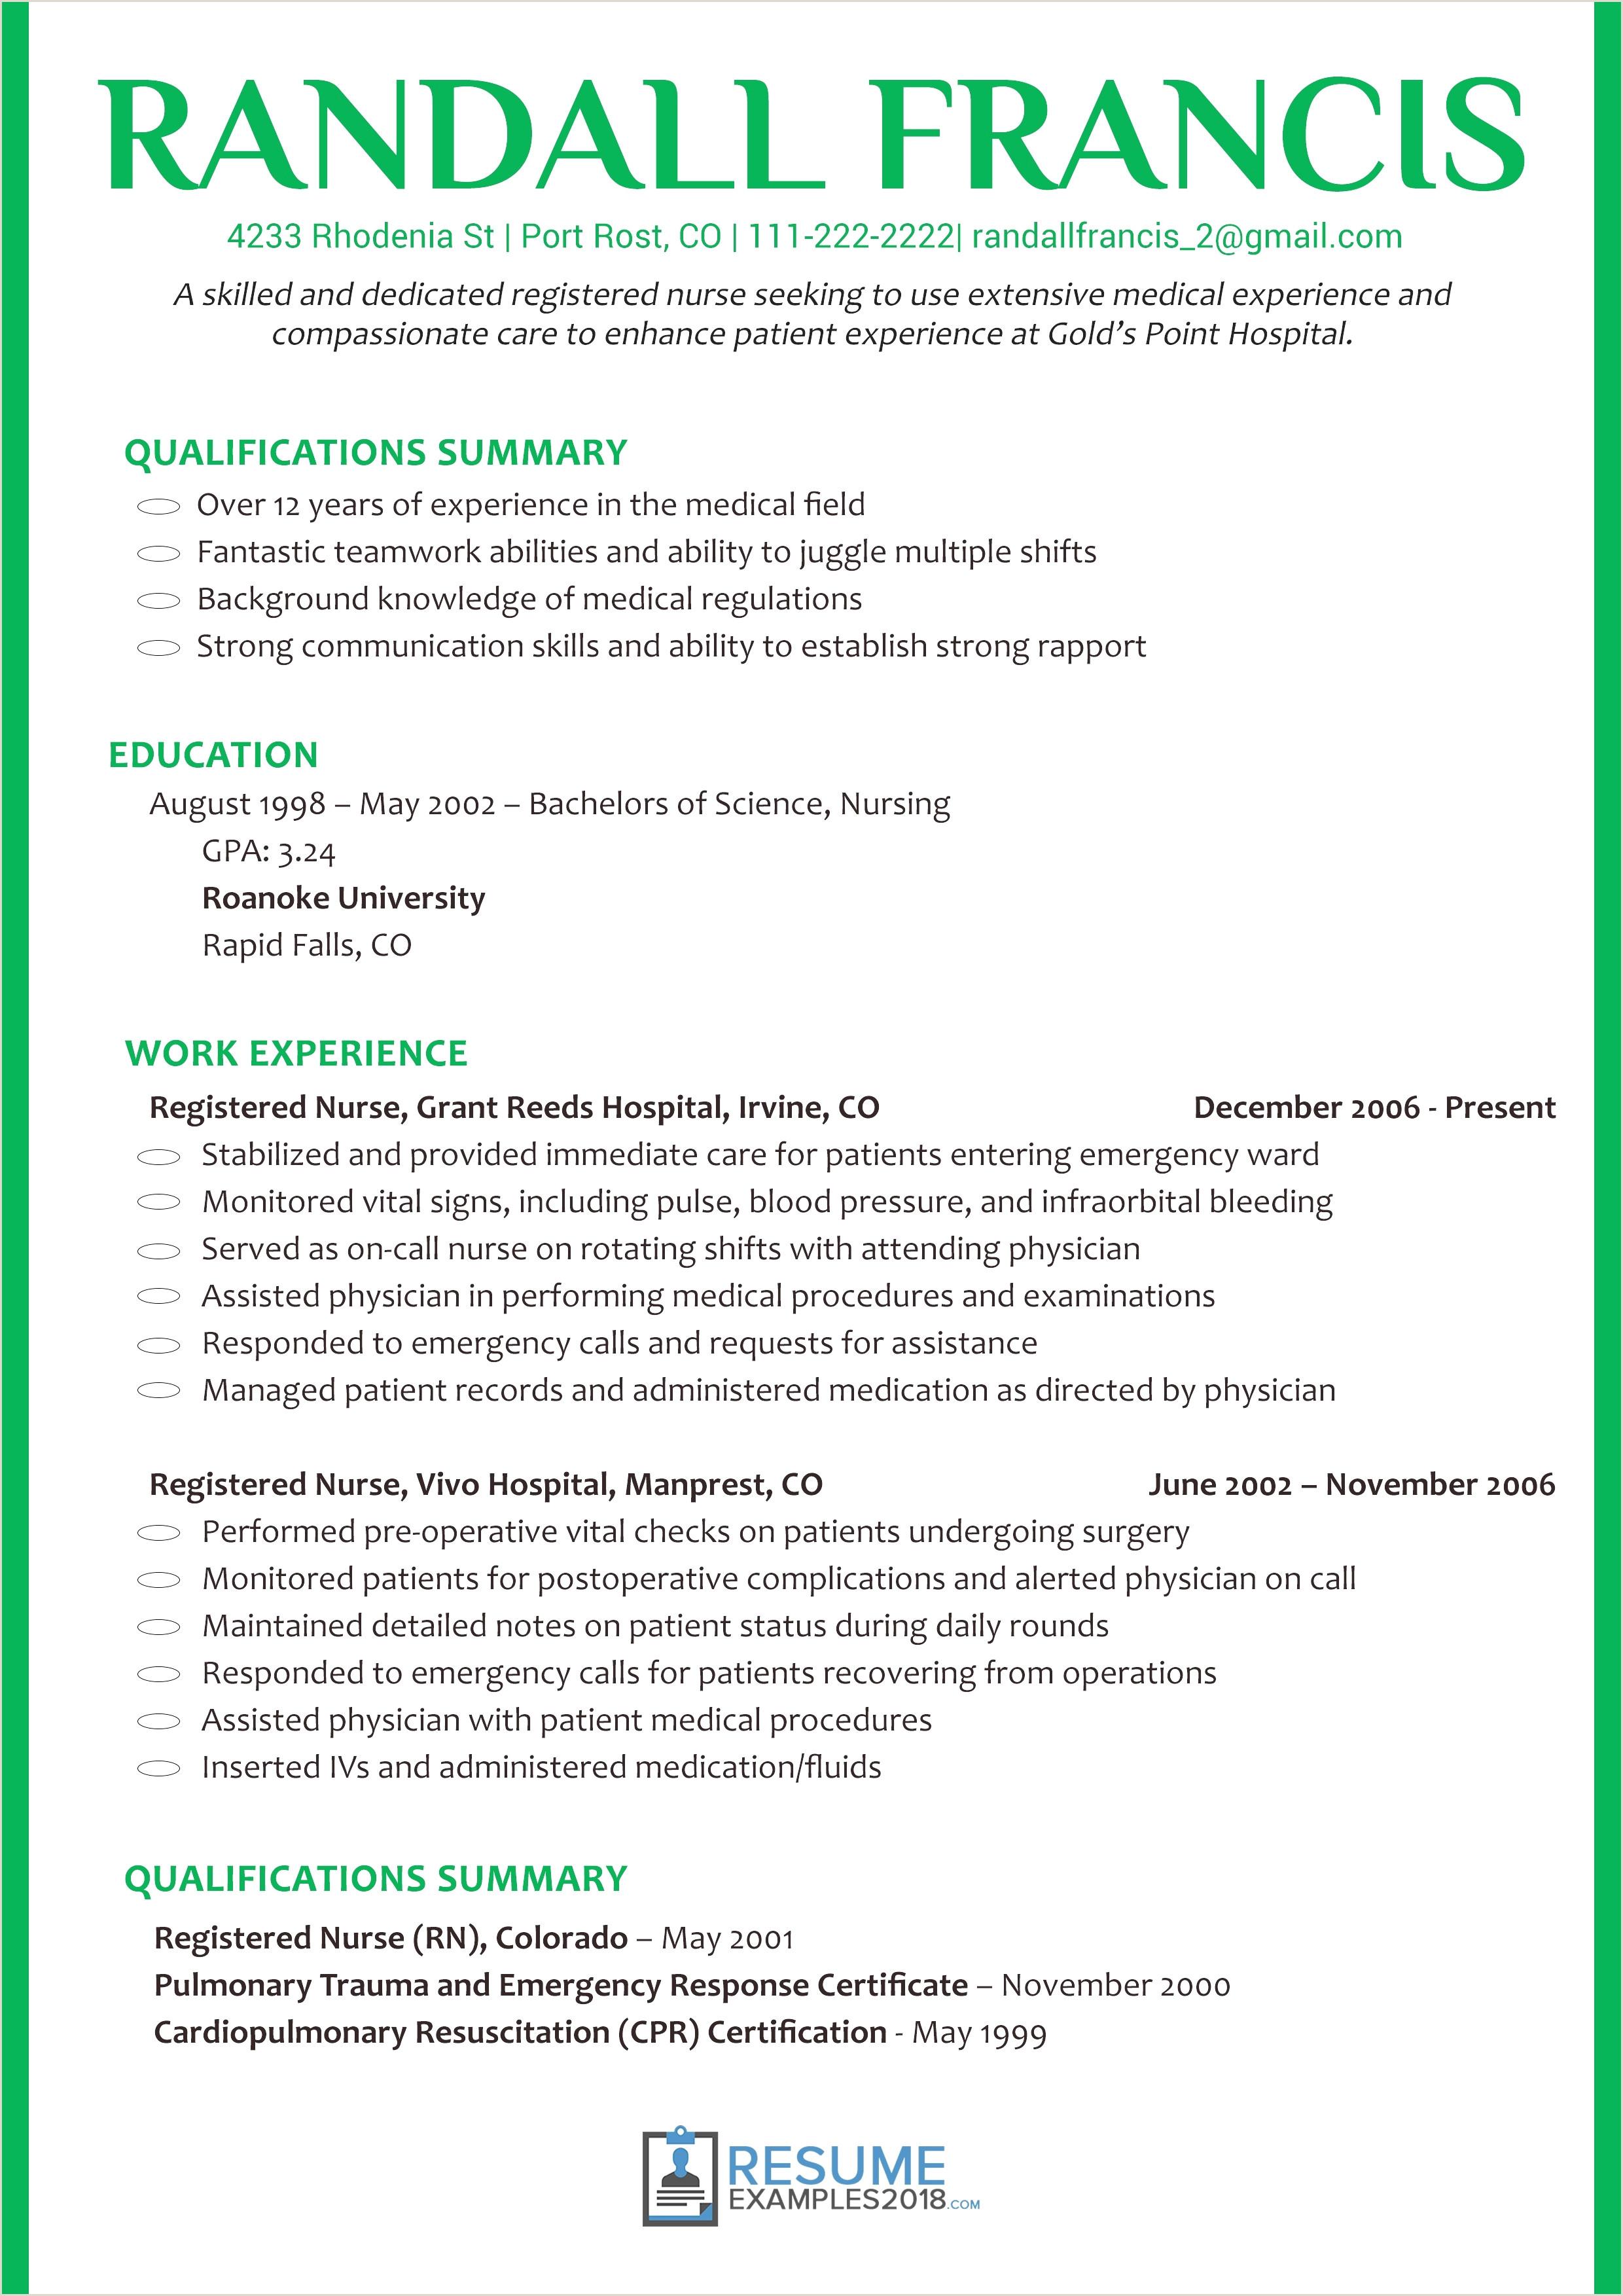 Nursing Background Elegant Cv Resume Fresh Resume or Cv